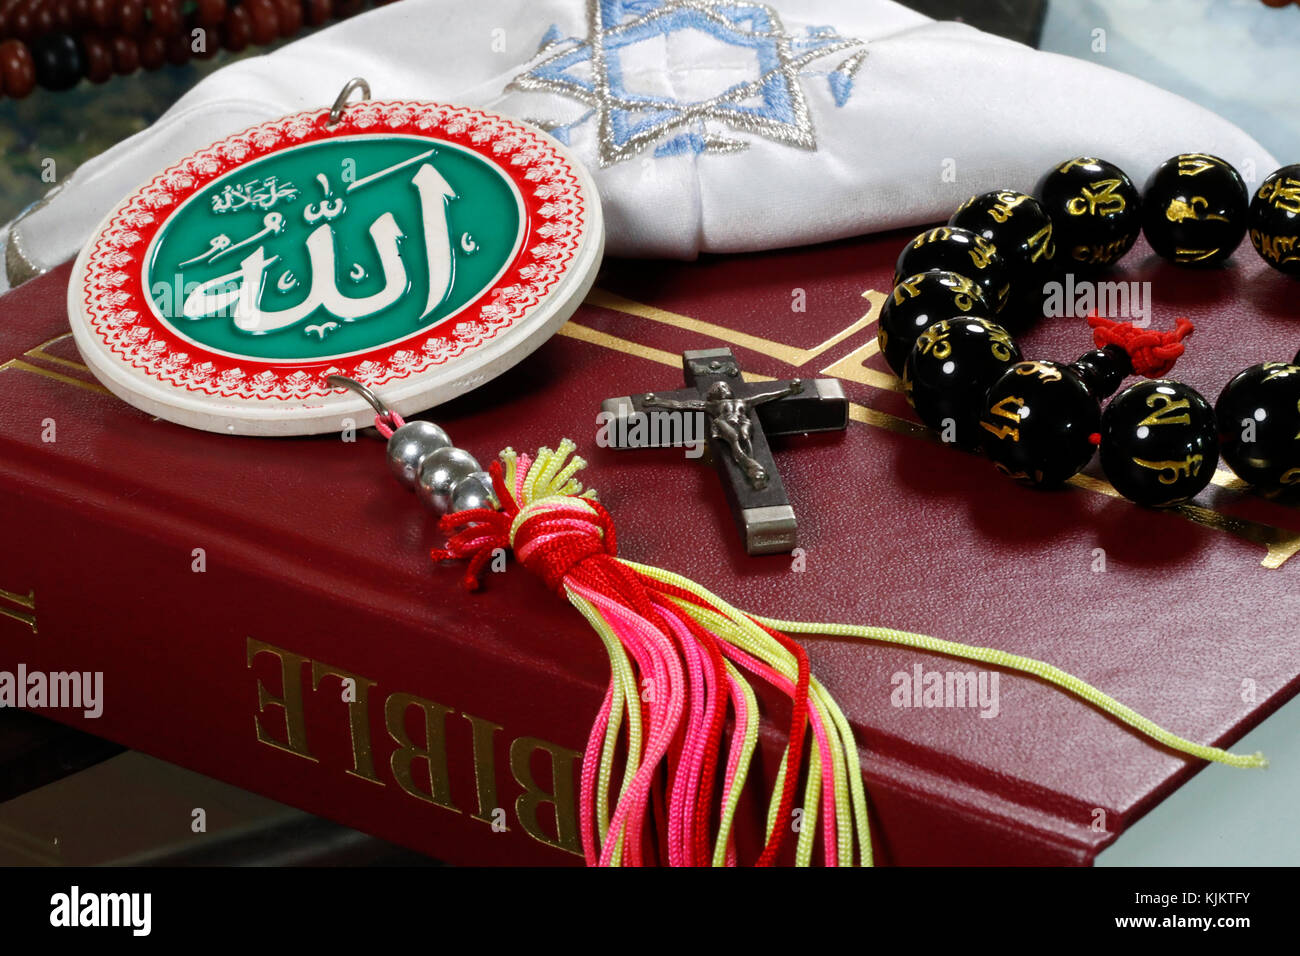 Christianity, buddhism,  Islam and Judaism. Interfaith symbols : bible, cucifix, Kippah, Allah monogram  and mala. - Stock Image